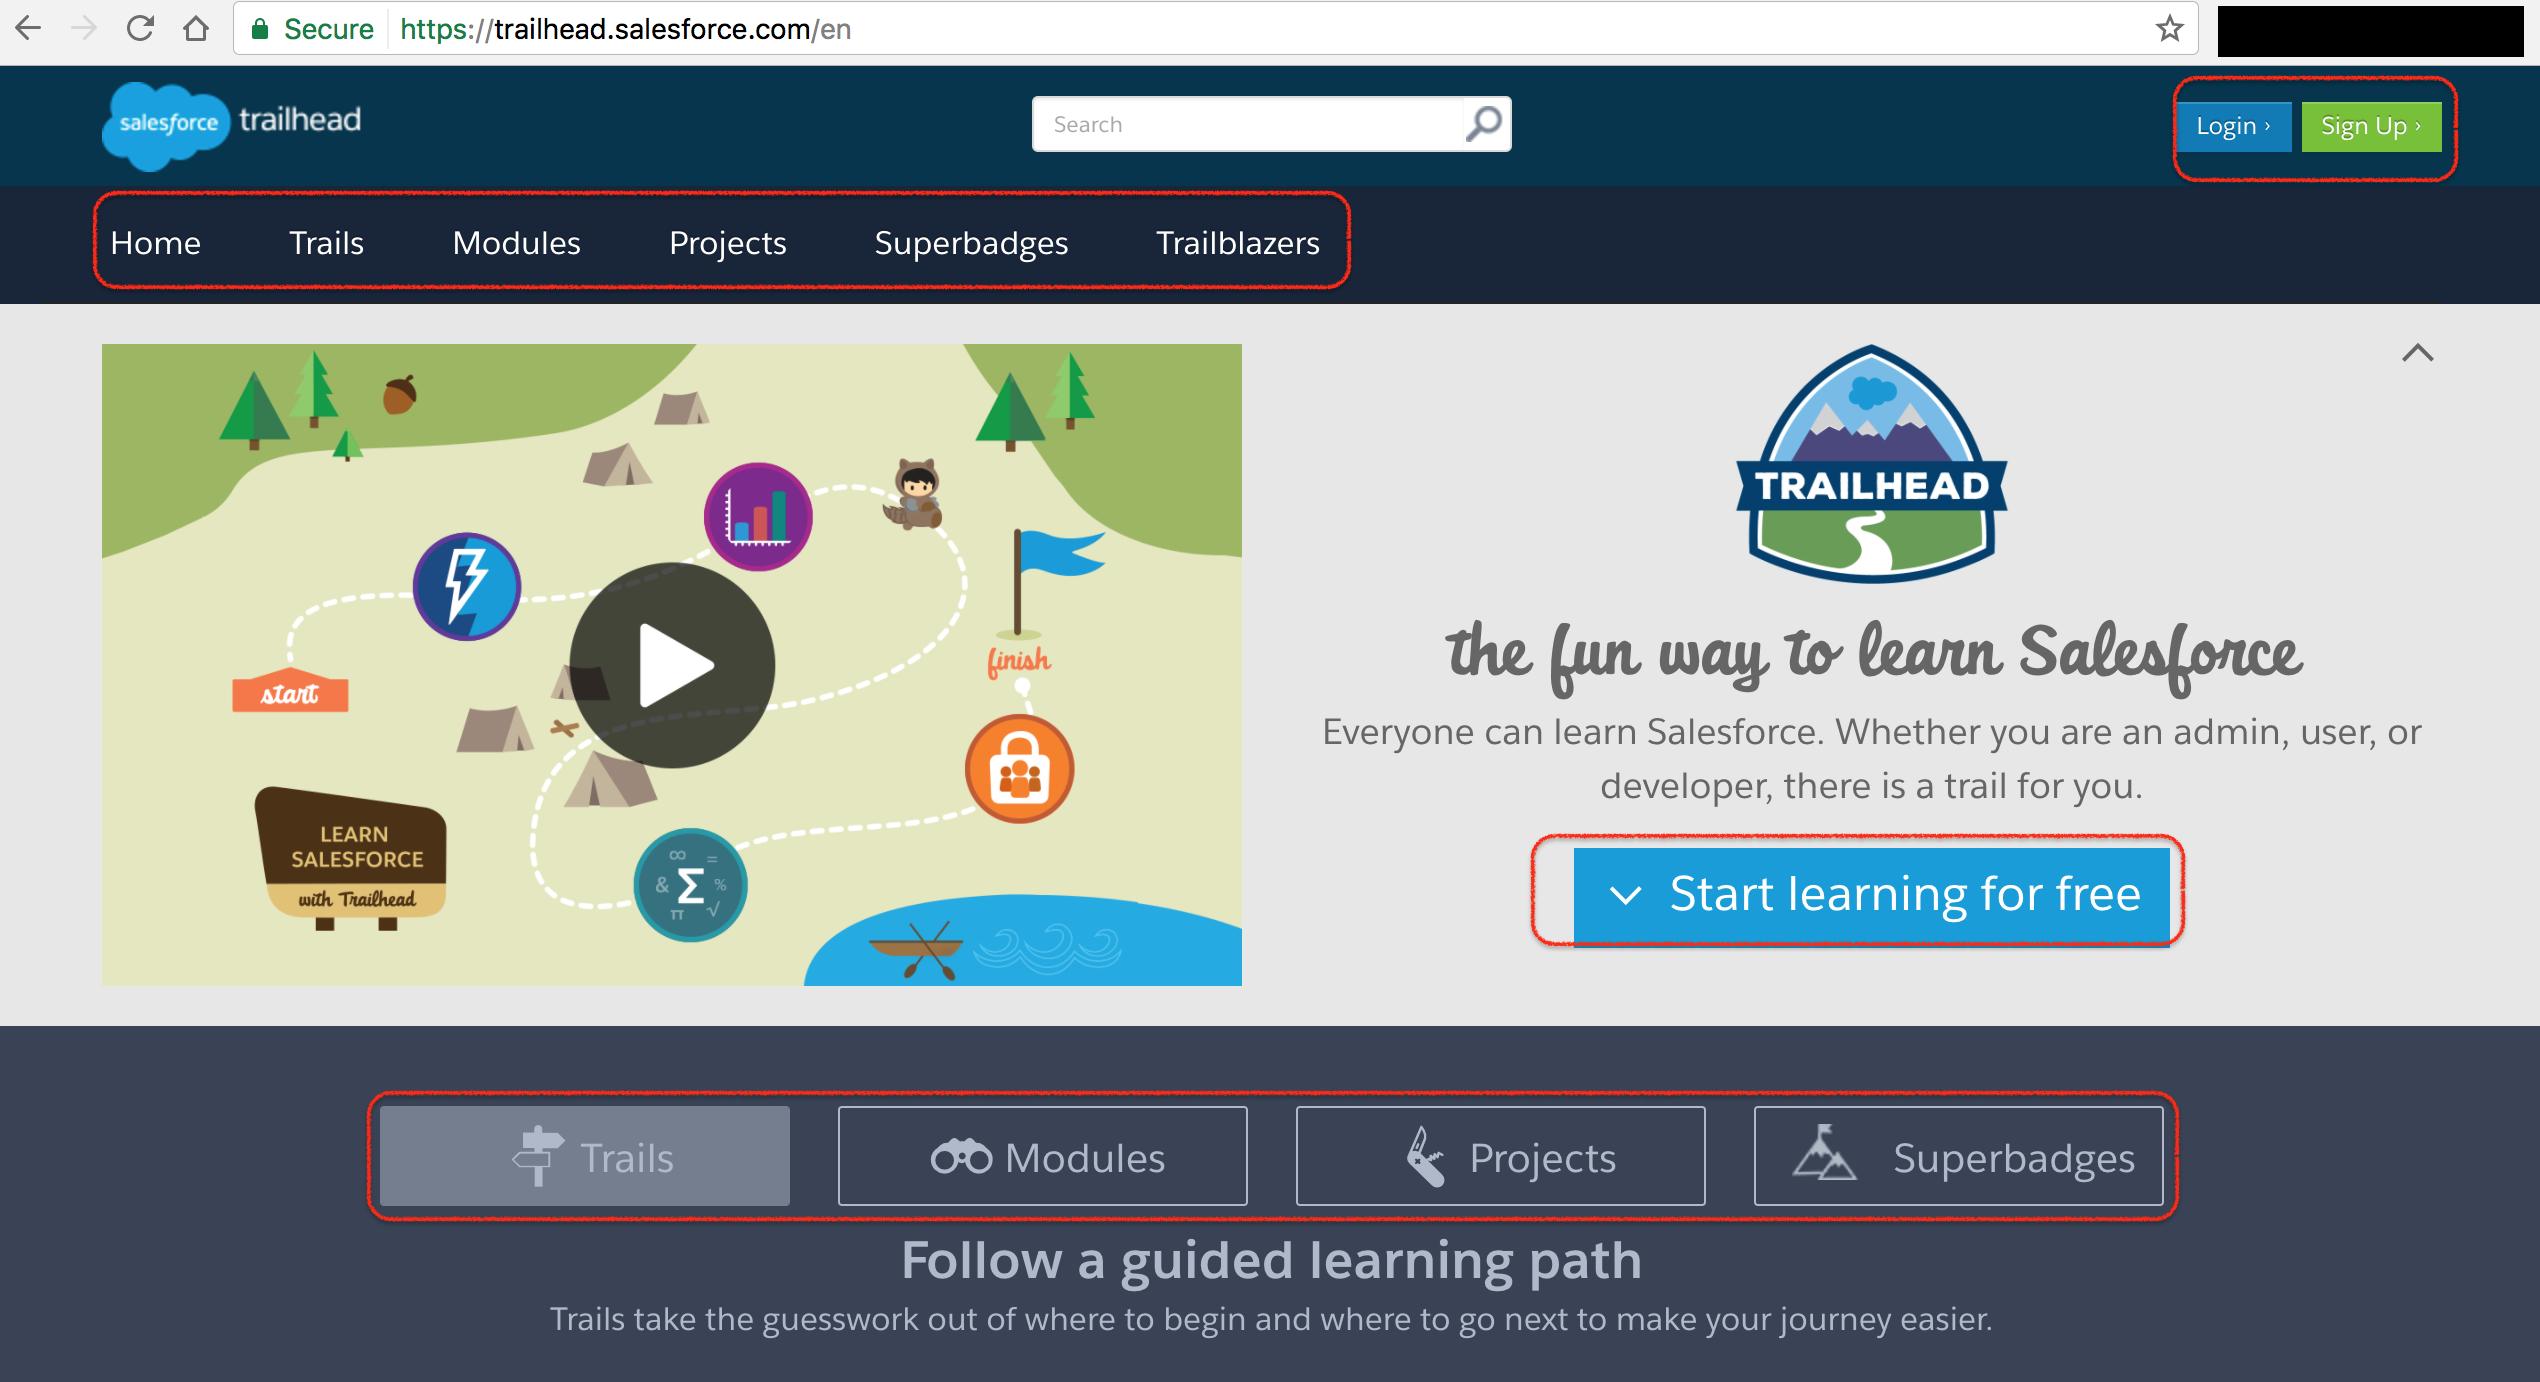 Salesforce Trailhead - Trails, Modules, Projects, Superbadges